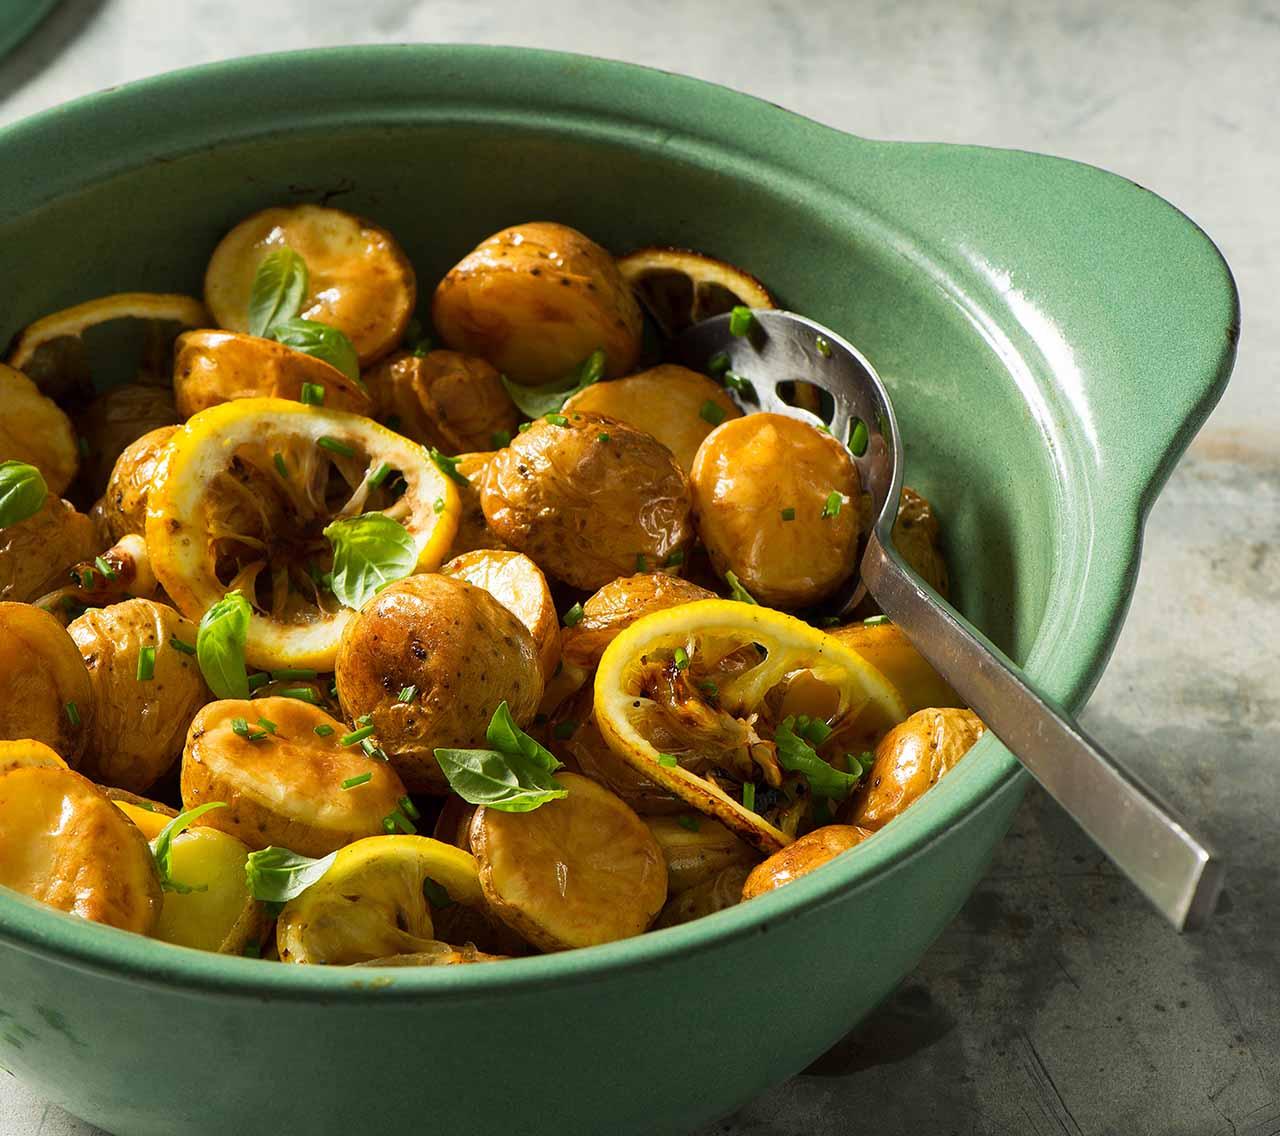 Garlic Parsley Mashed Potatoes